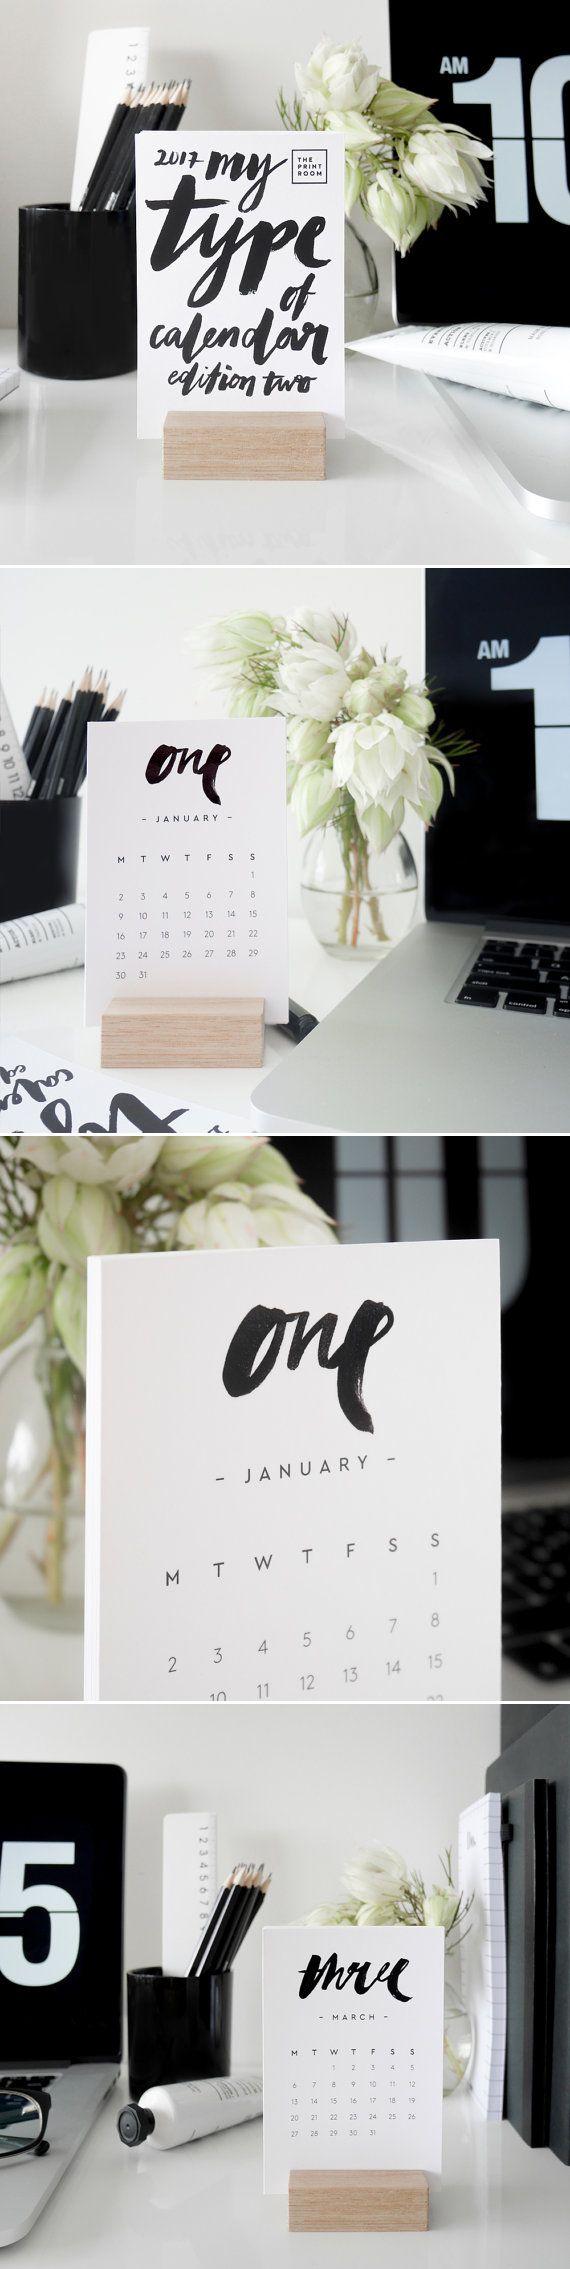 My Type of Calendar Edition 2 // 2017 Brush Type Desk Calendar | ThePrintRoomDesign